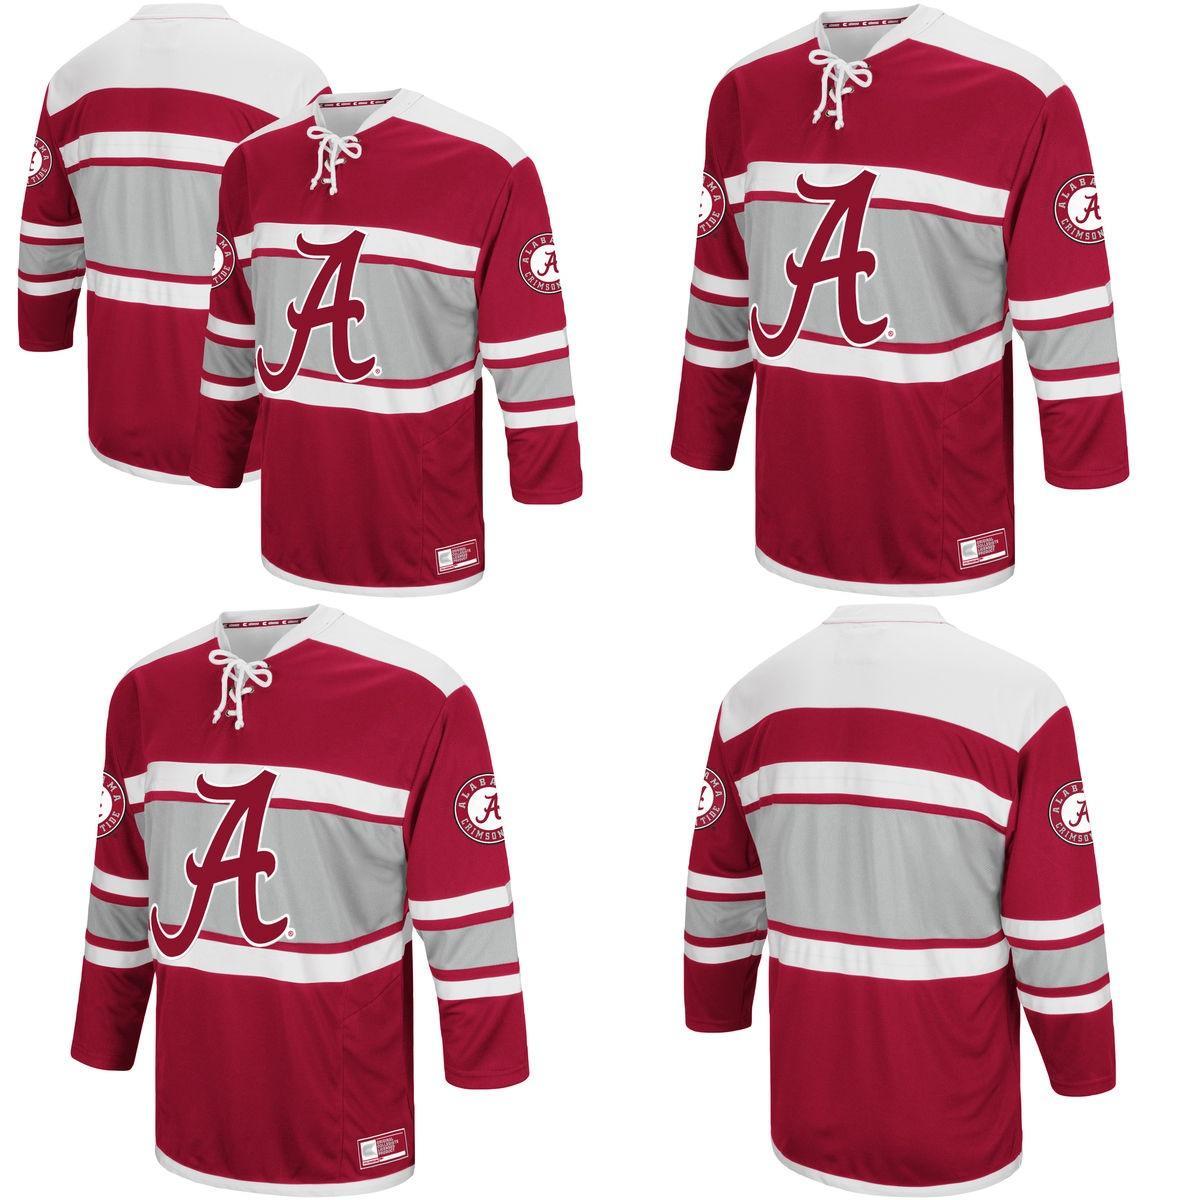 New Customize NCAA Alabama Crimson Tide College Jersey Mens Womens ... 709d3bd6c